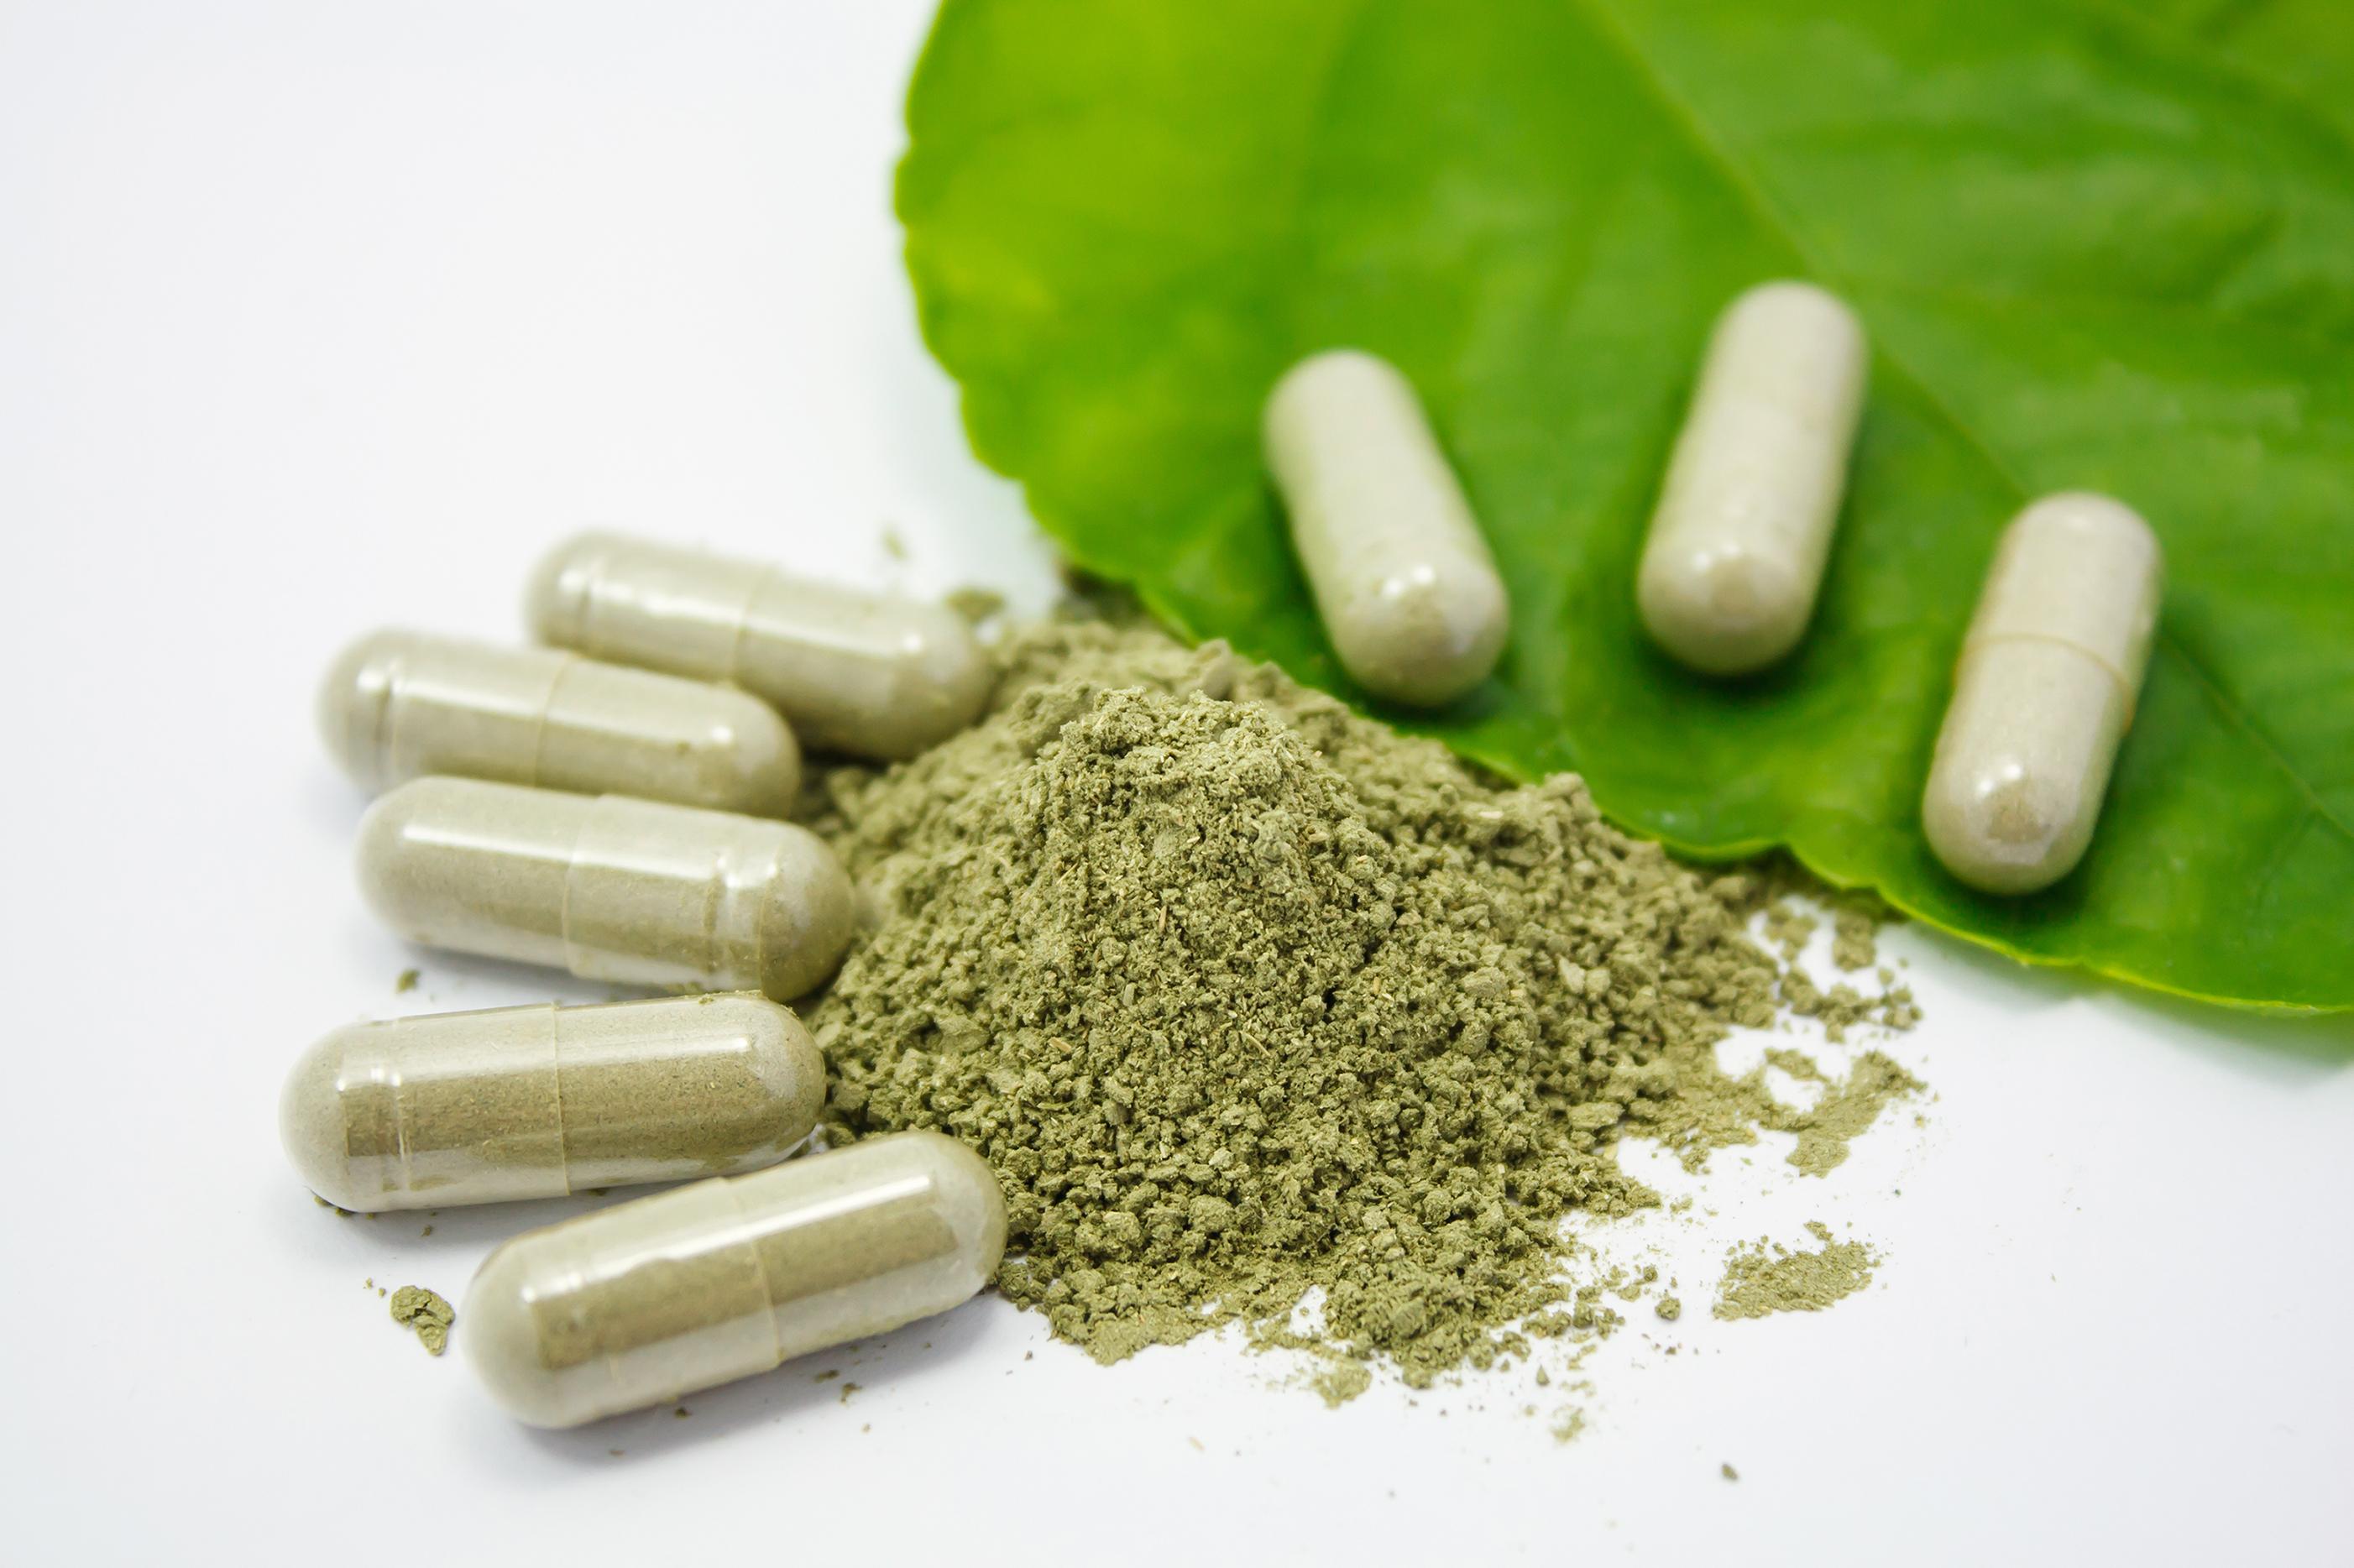 Interactions entre les produits naturels et les médicaments